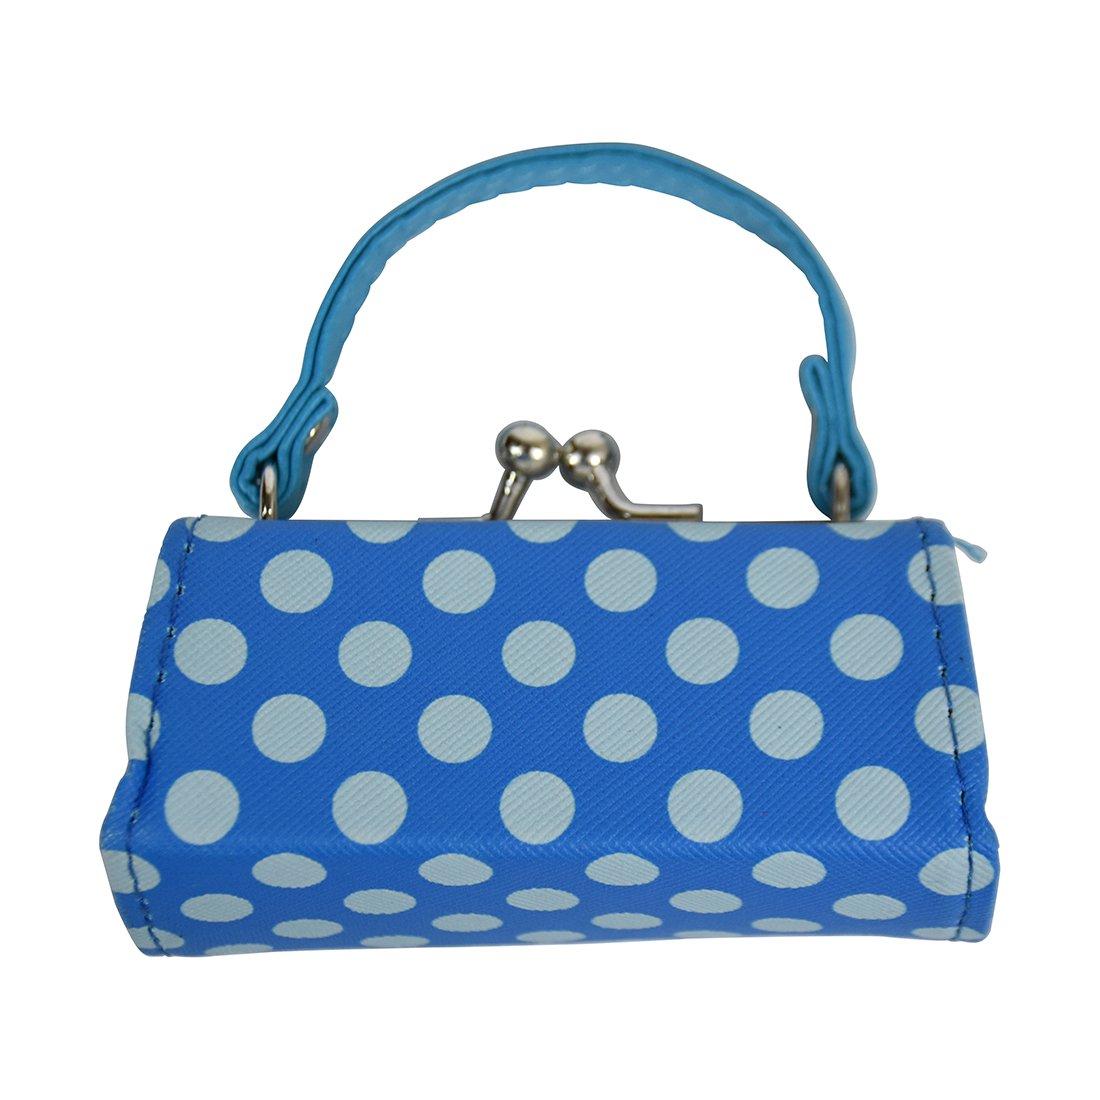 Polka Dot Lipstick Case with Handle Mini Purse - Blue